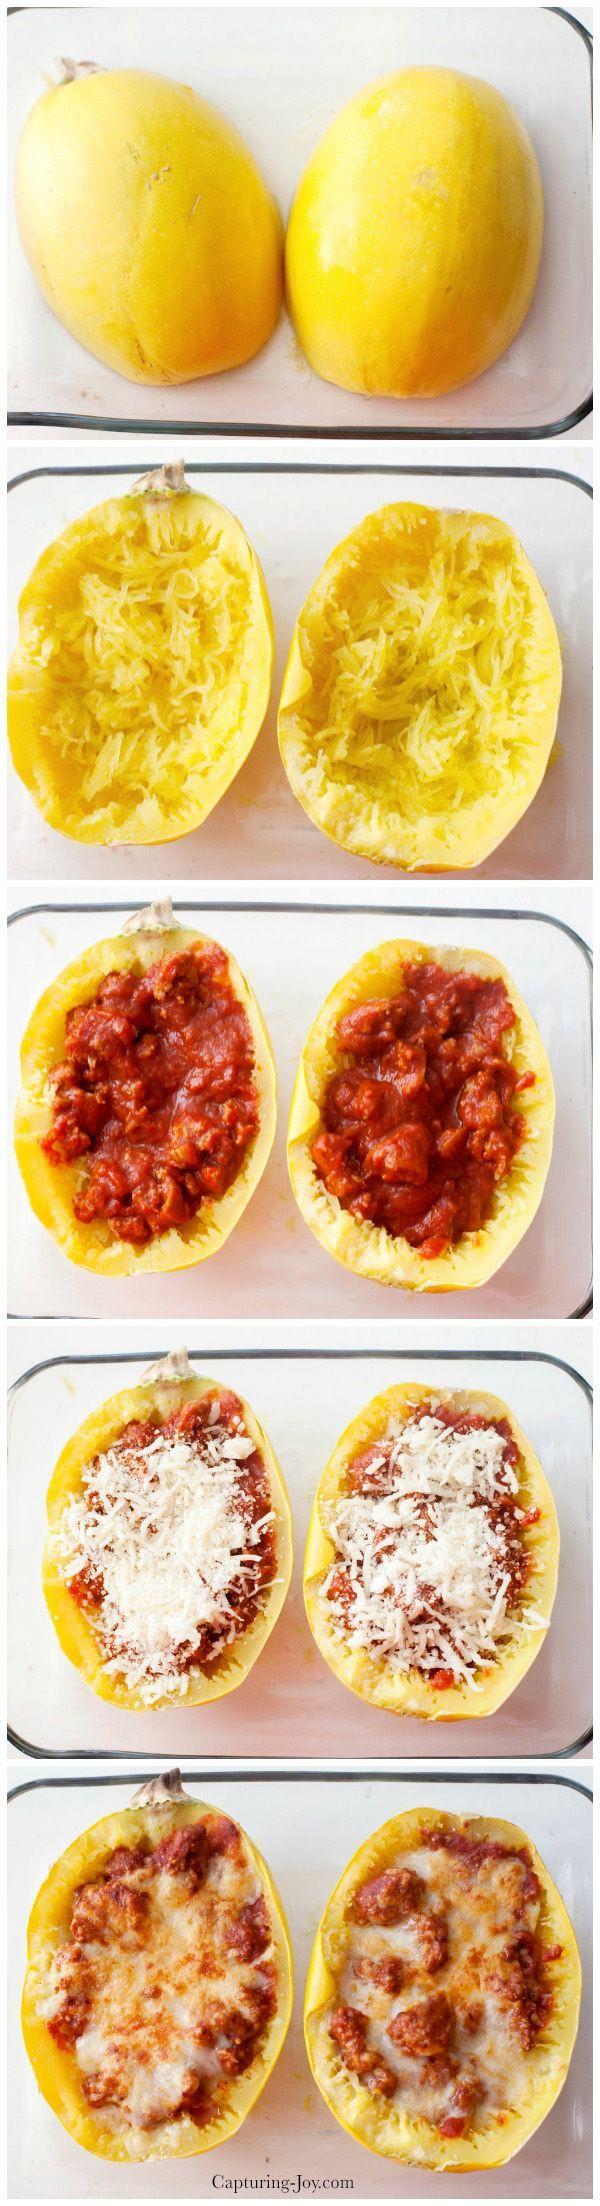 Spaghetti Squash Boat Recipe!  A healthy dinner for the whole family!  www.kristendukephotography.com: